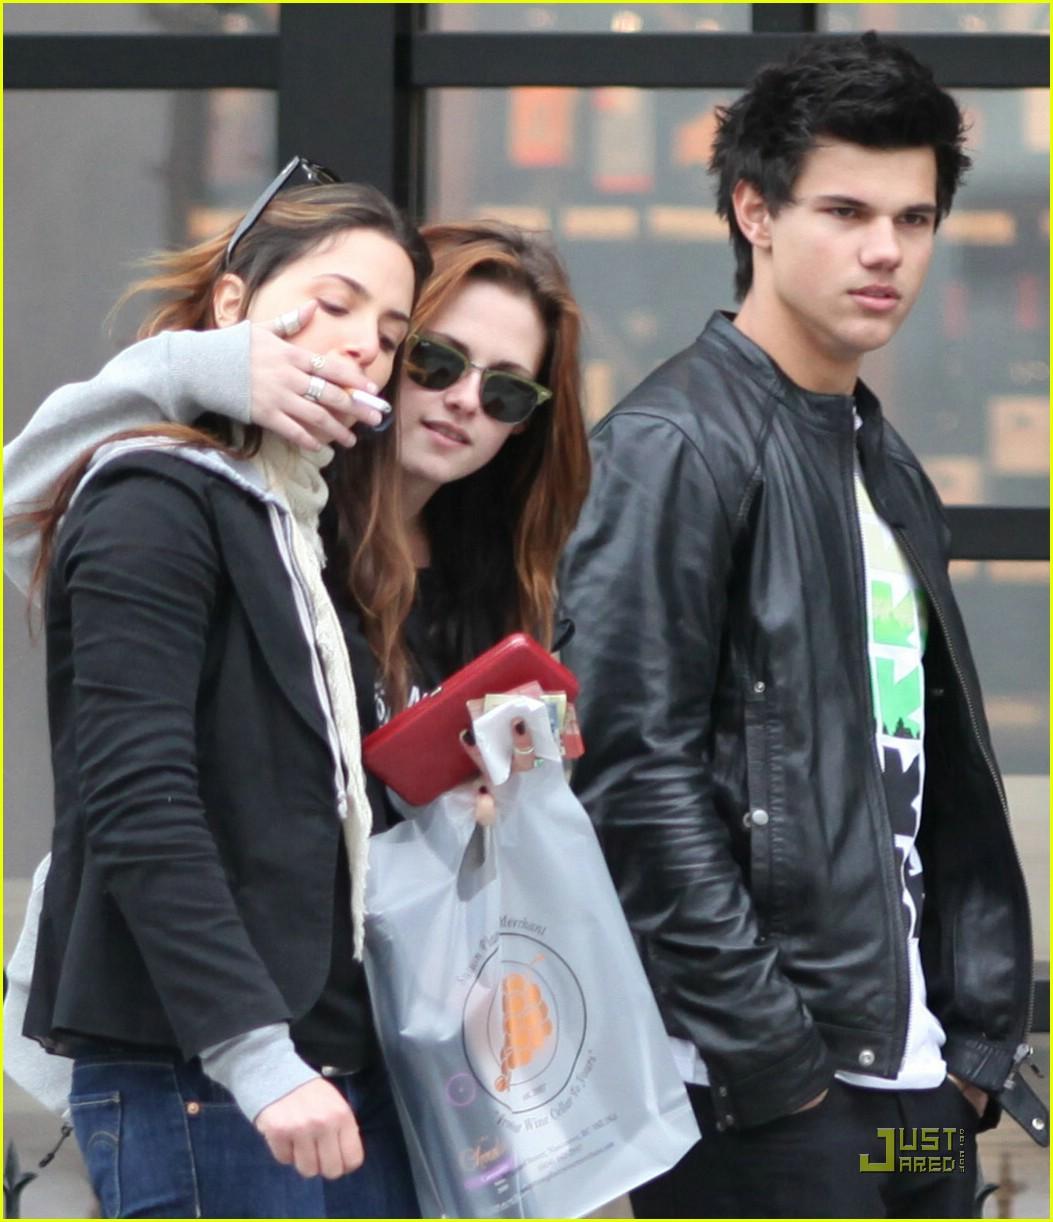 Taylor Lautner Kristen Stewart Shopping Spree Photo 92861